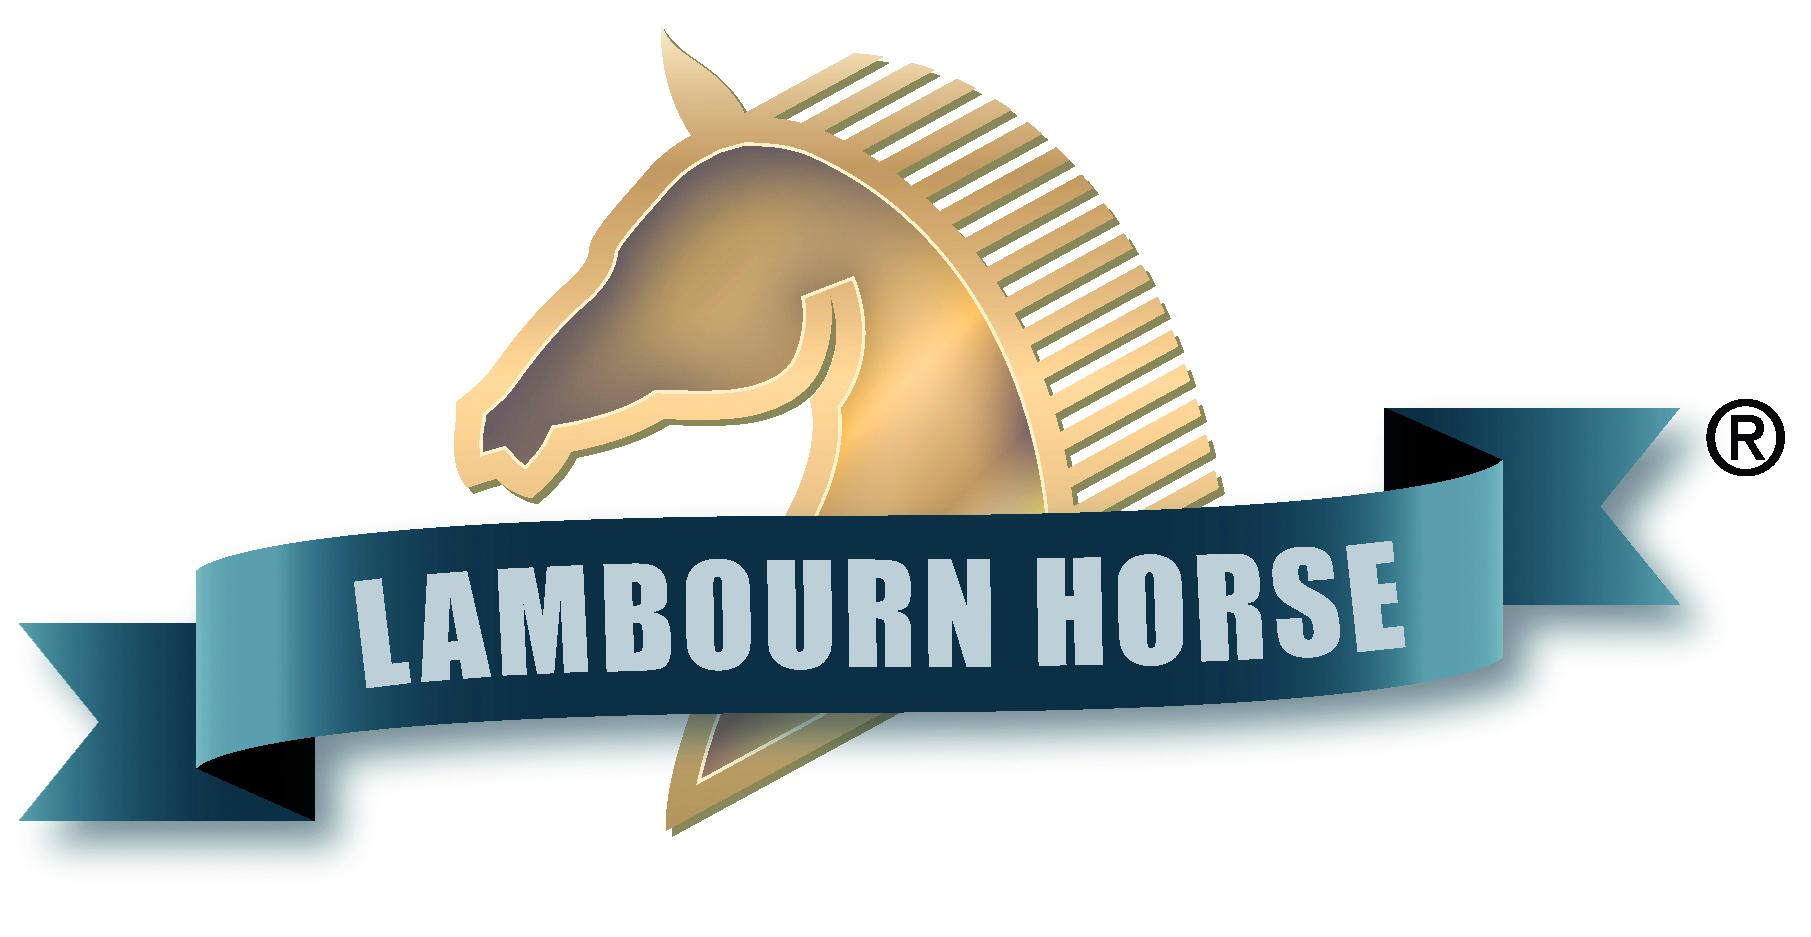 Lambourn-Horse